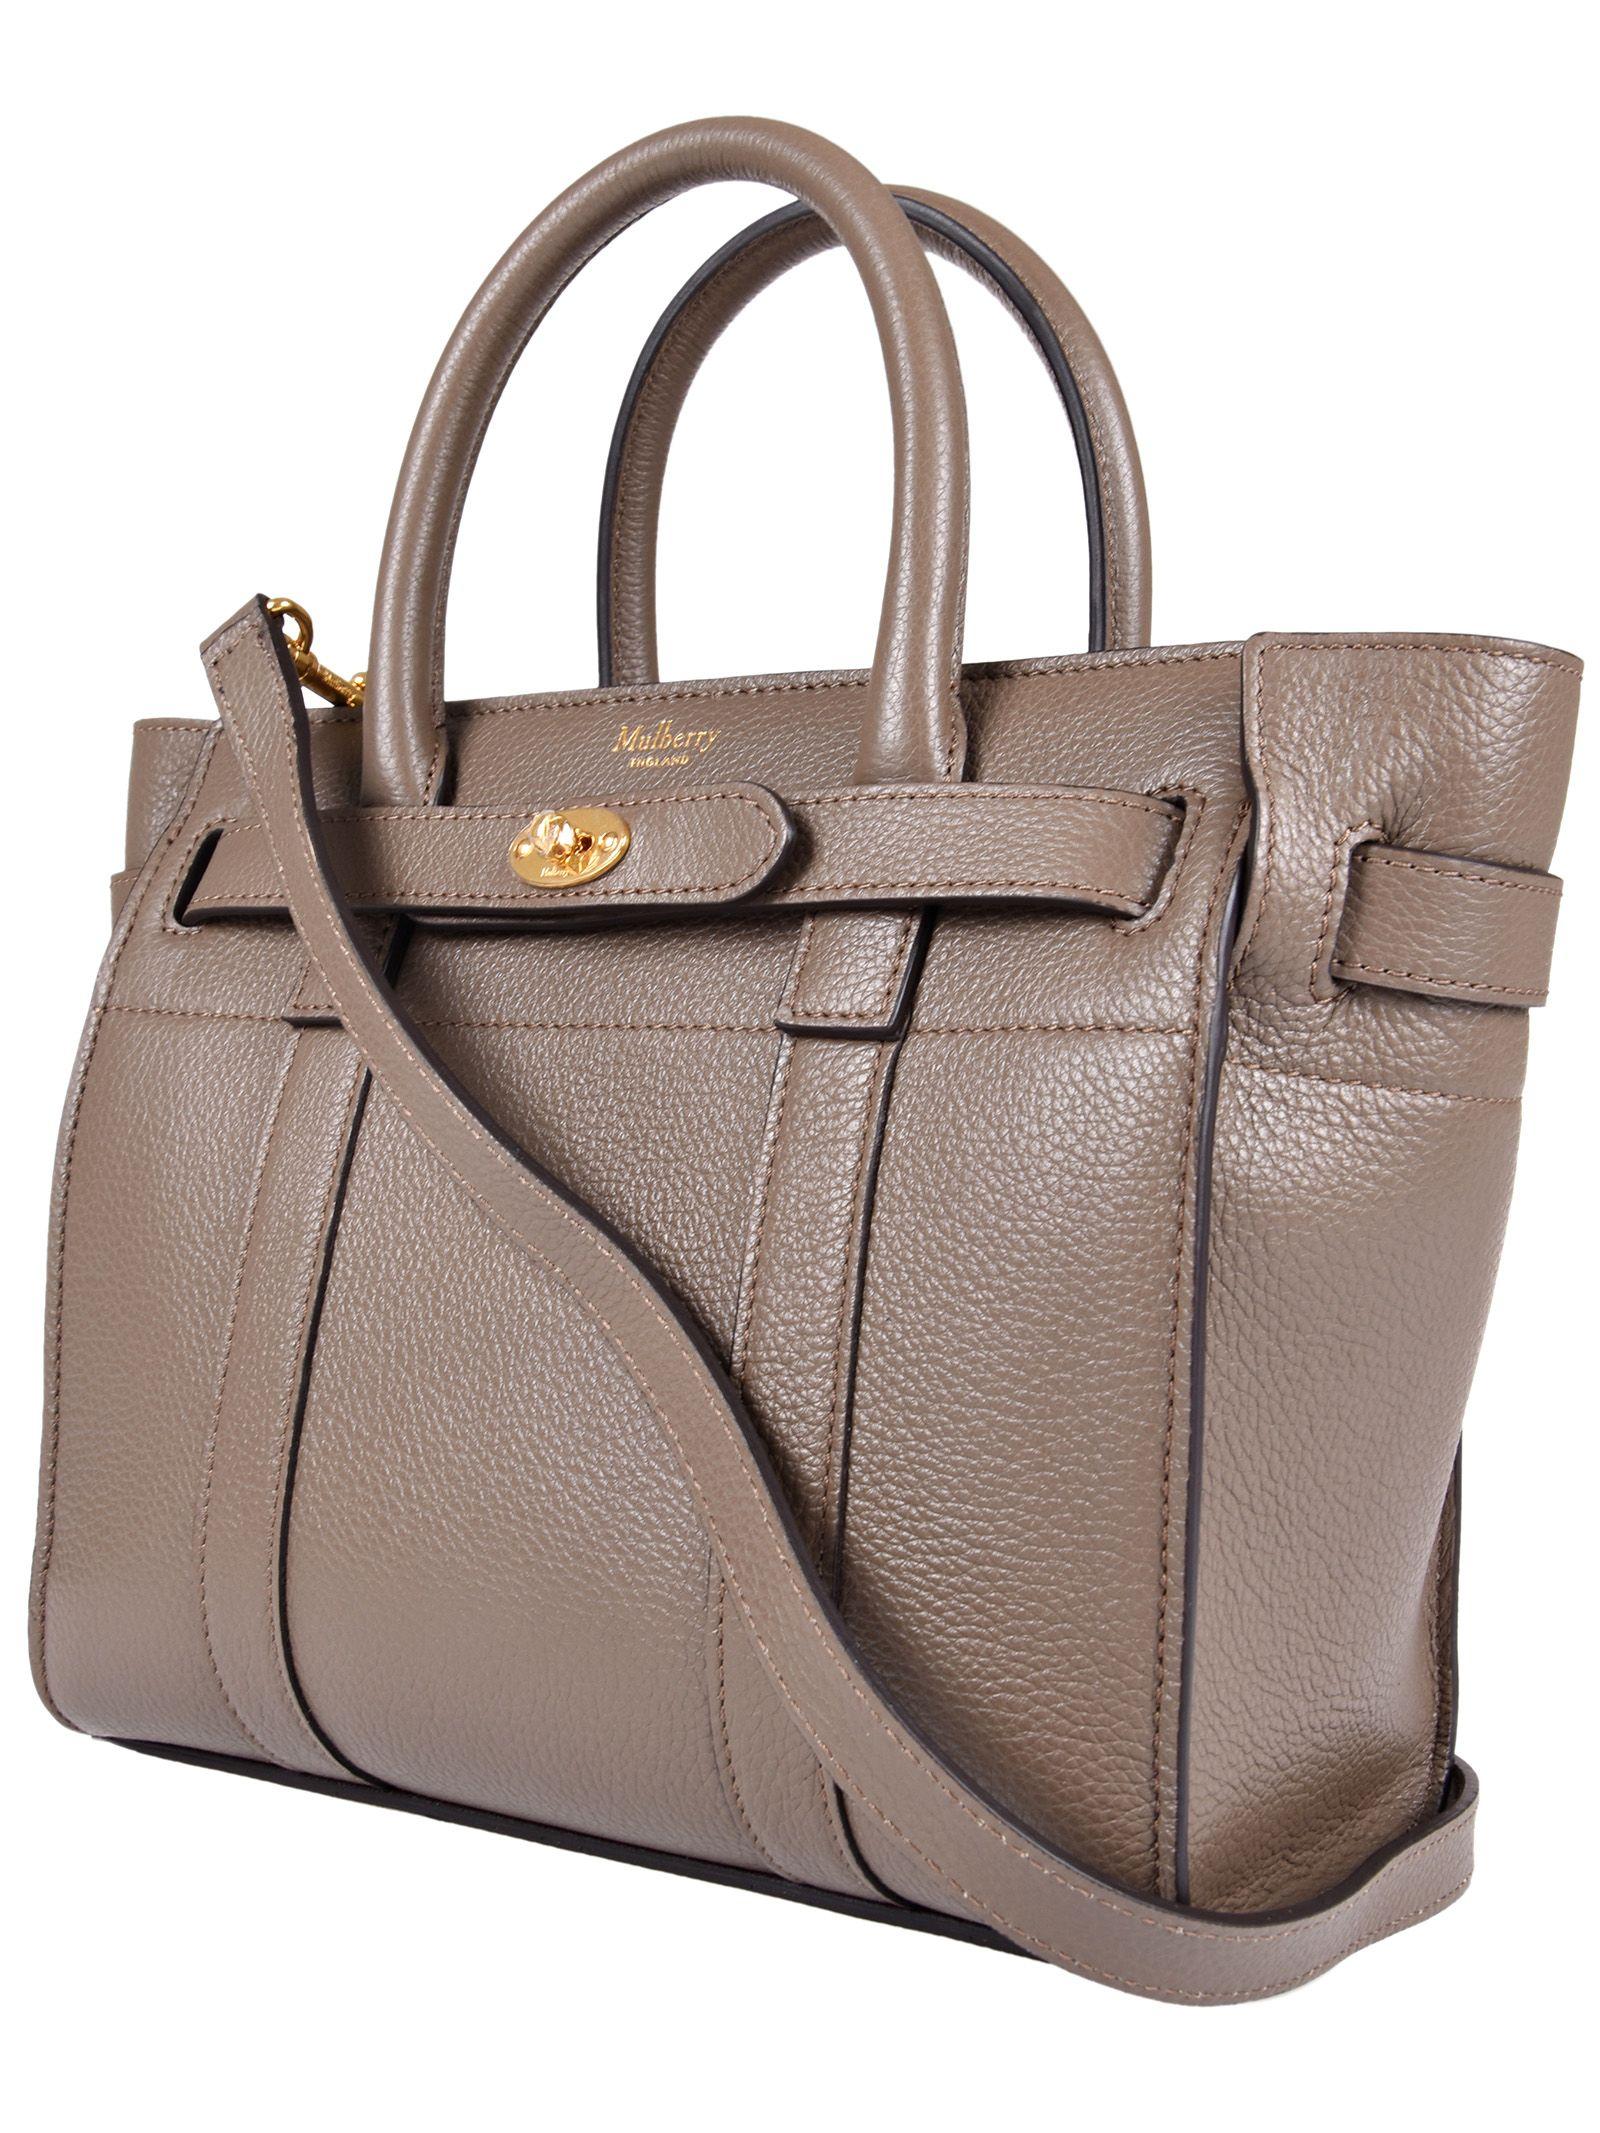 9aca7e2dd803 Mulberry Mini Bayswater Shoulder Bag - Dclay ... uk availability ba07c ...